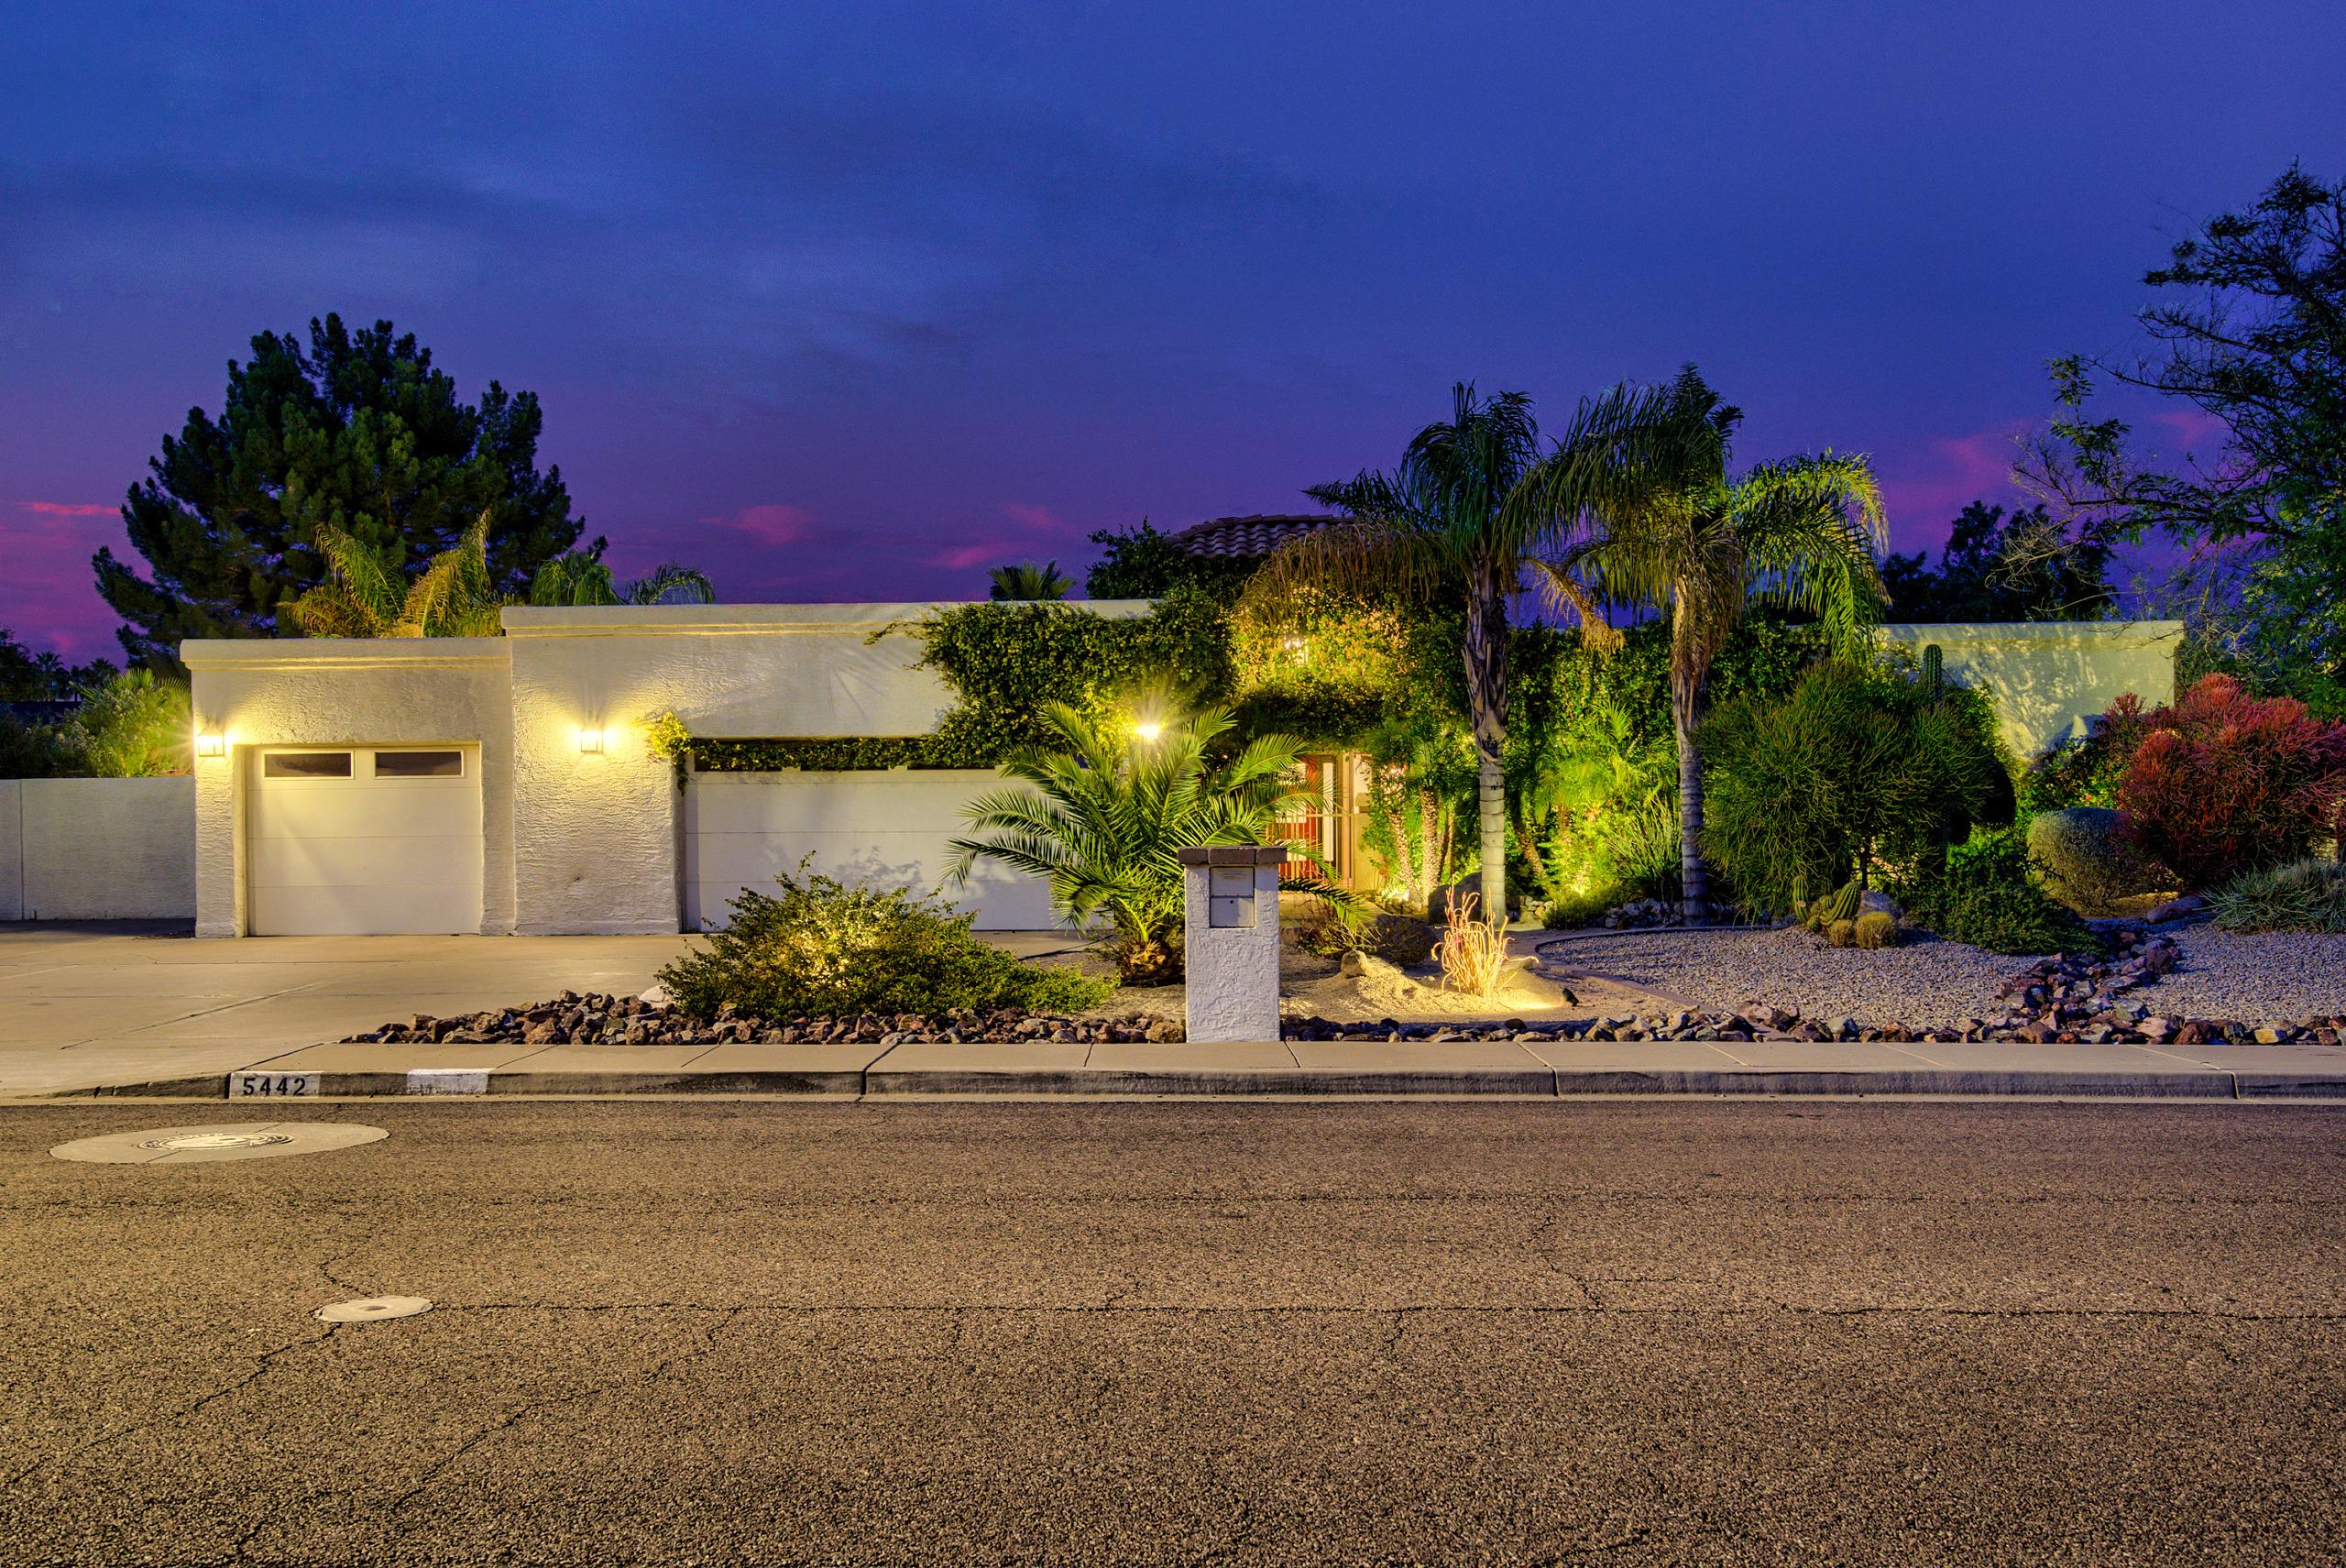 5442 E Acoma Dr., Scottsdale, AZ 85254